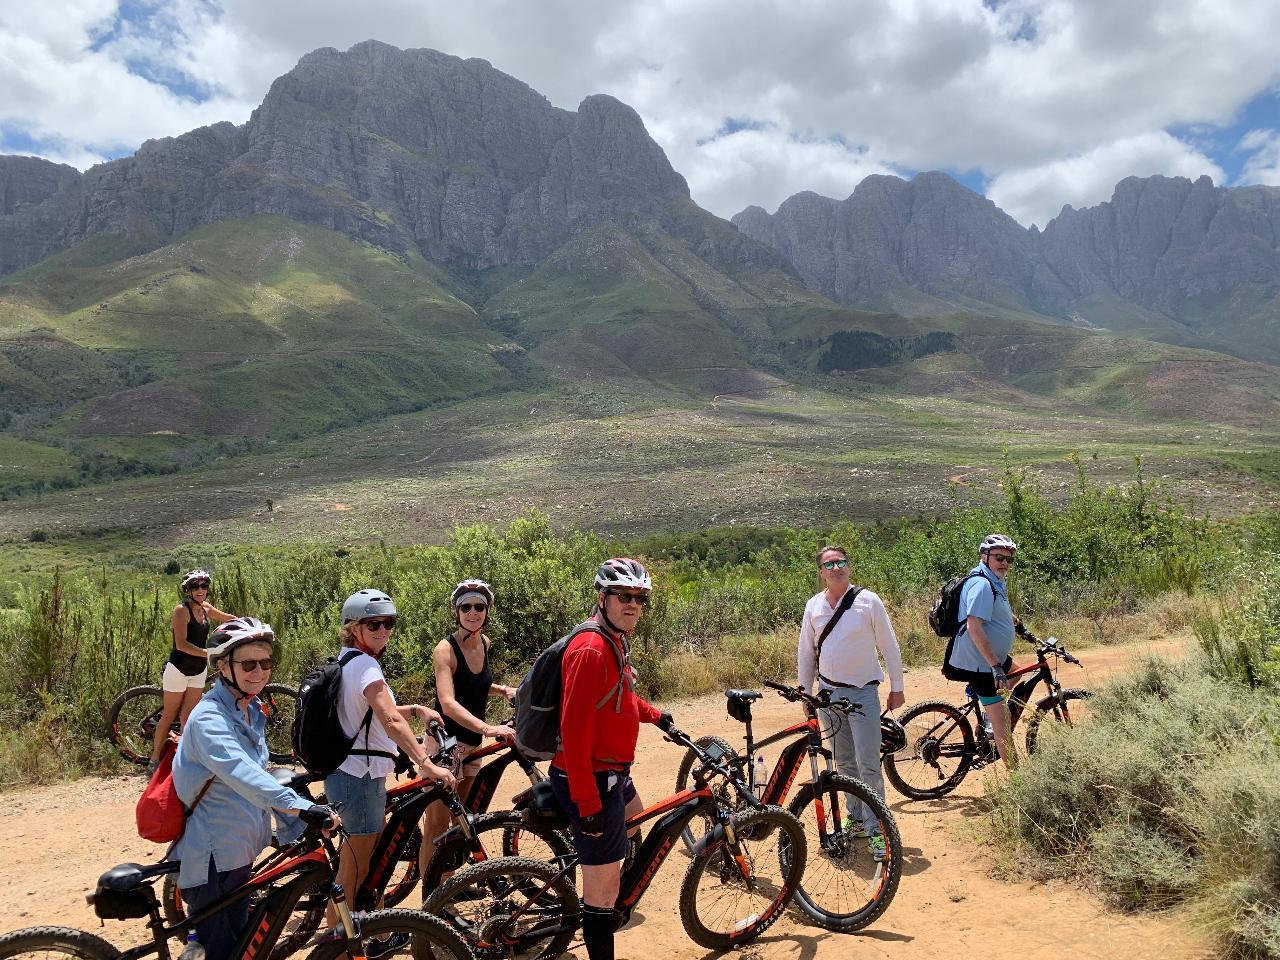 Jonkershoek Stellenbosch Tour           (Sorry, unavailable at the moment)